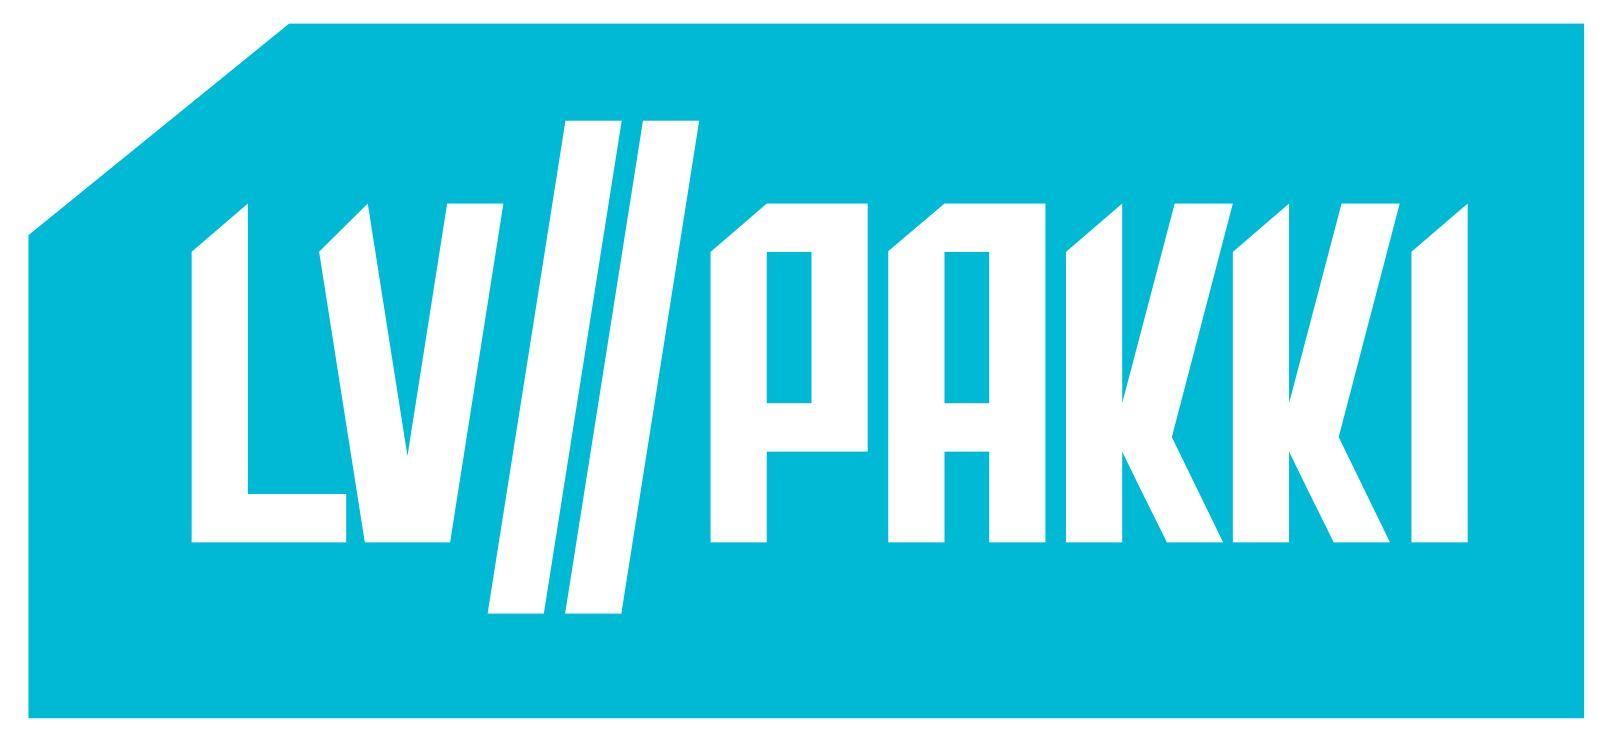 LVPakki